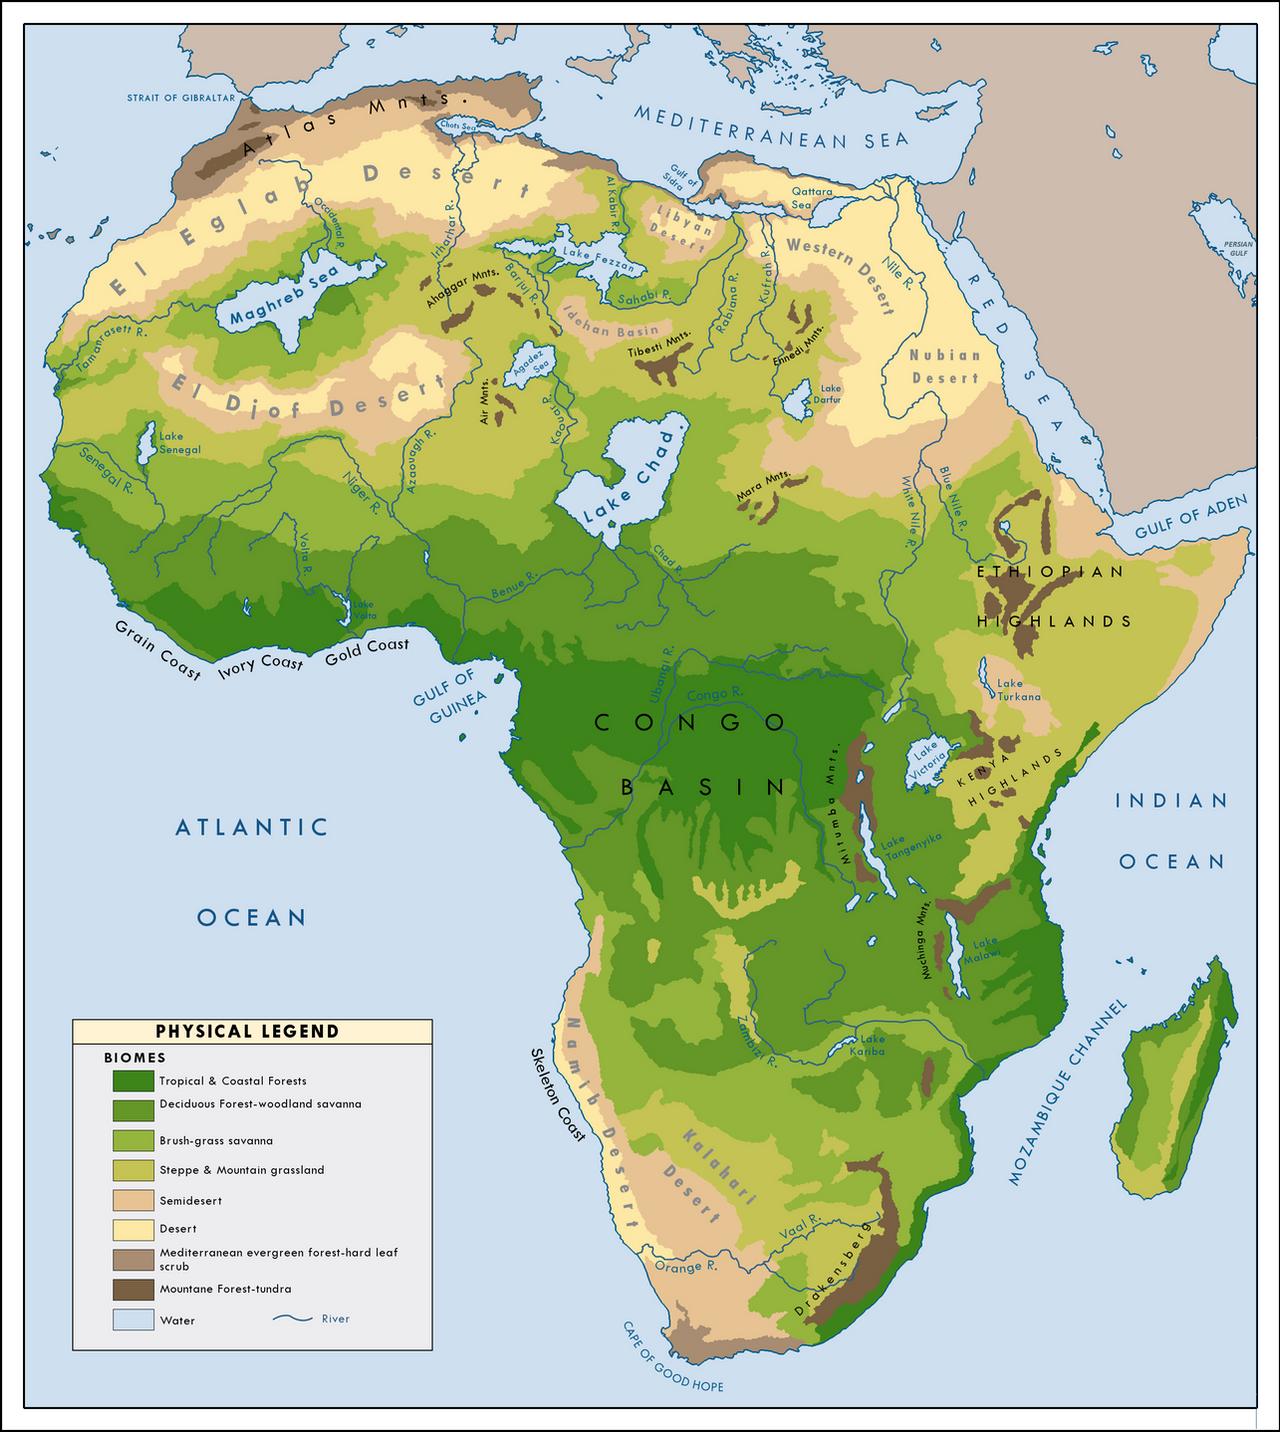 Seas of the Sahara by YNot1989 on DeviantArt Sahara Map on arabian peninsula map, sudan map, namib map, congo basin map, great rift valley map, atlas mountains map, mecca map, gobi map, lake tanganyika map, zambezi river map, zagros mountains map, red sea map, kalahari map, madagascar map, desert map, sahel map, cape of good hope map, taurus mountains map, atacama map, africa map,